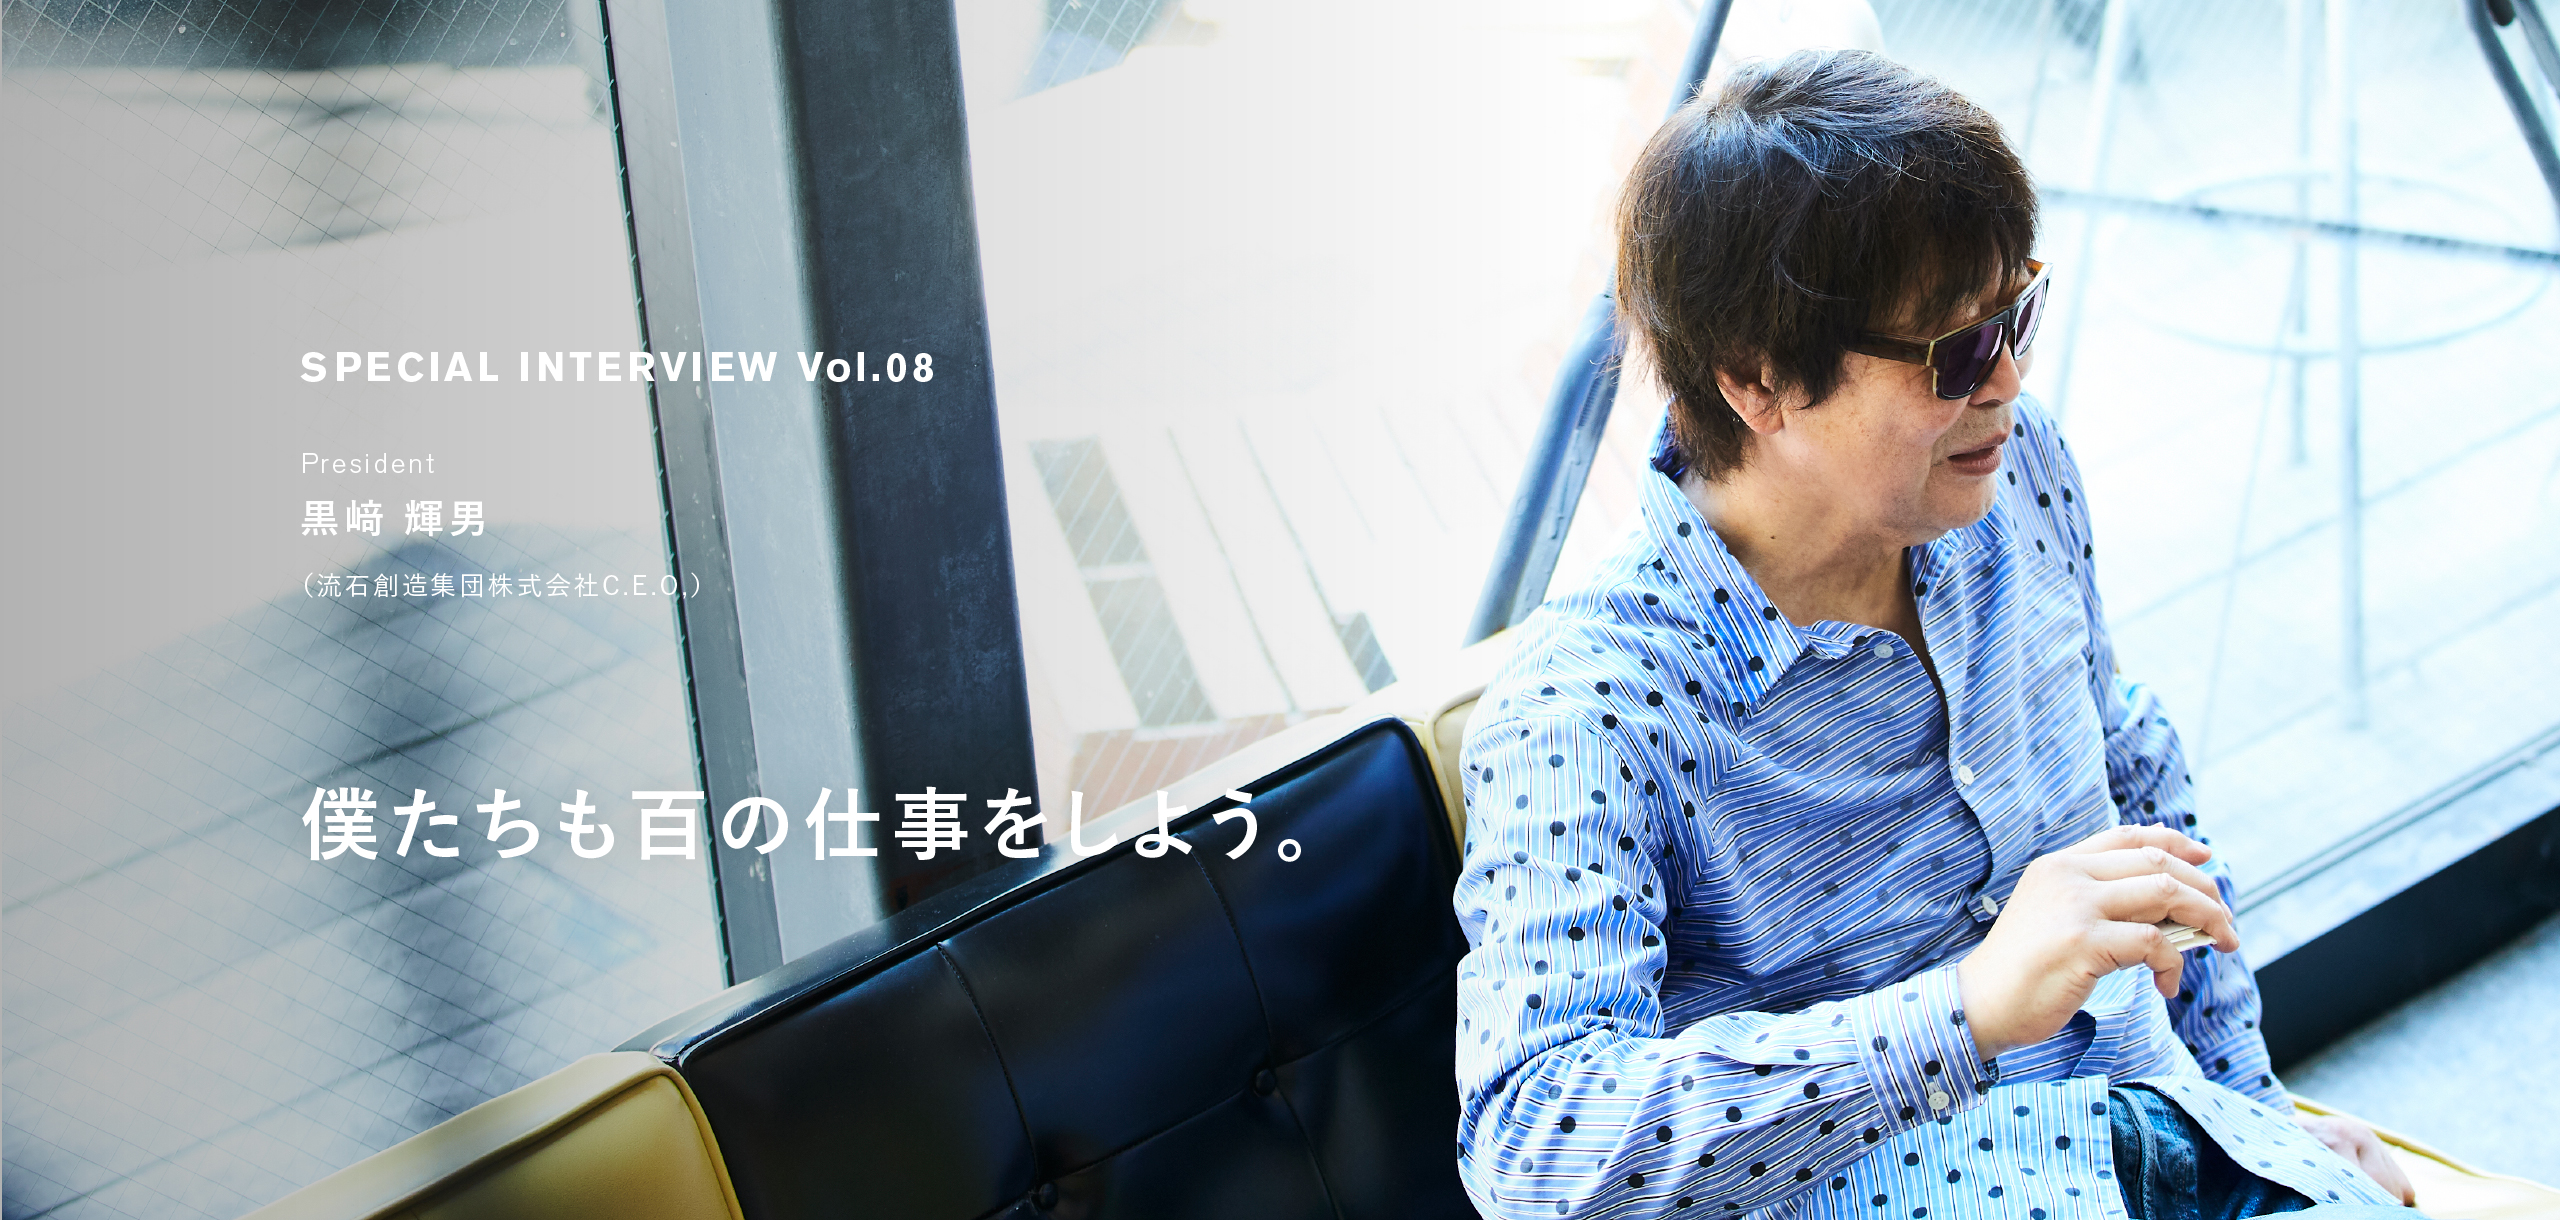 Interview Vol.08 黒﨑 輝男|僕たちも百の仕事をしよう。